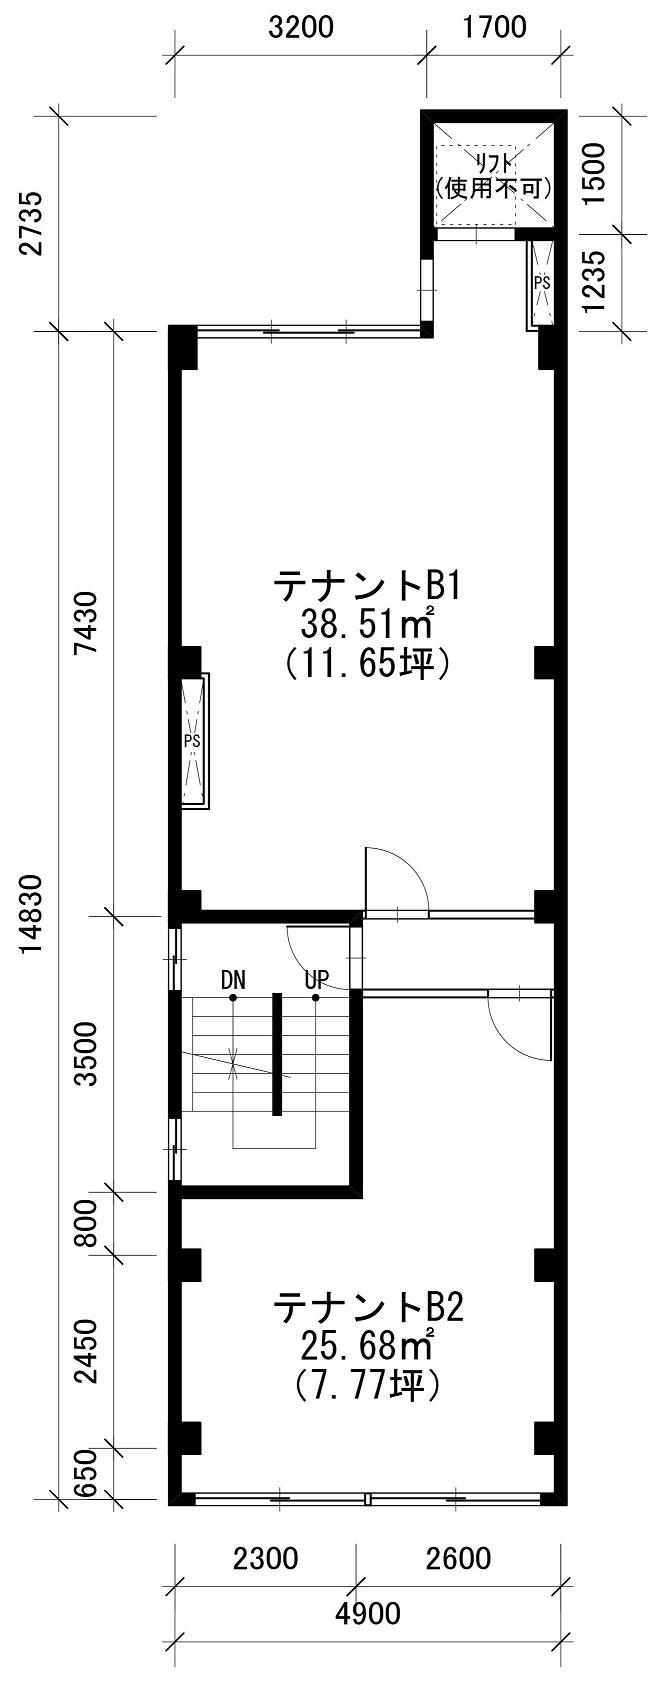 The Office葵 2階平面図161121(HP用)